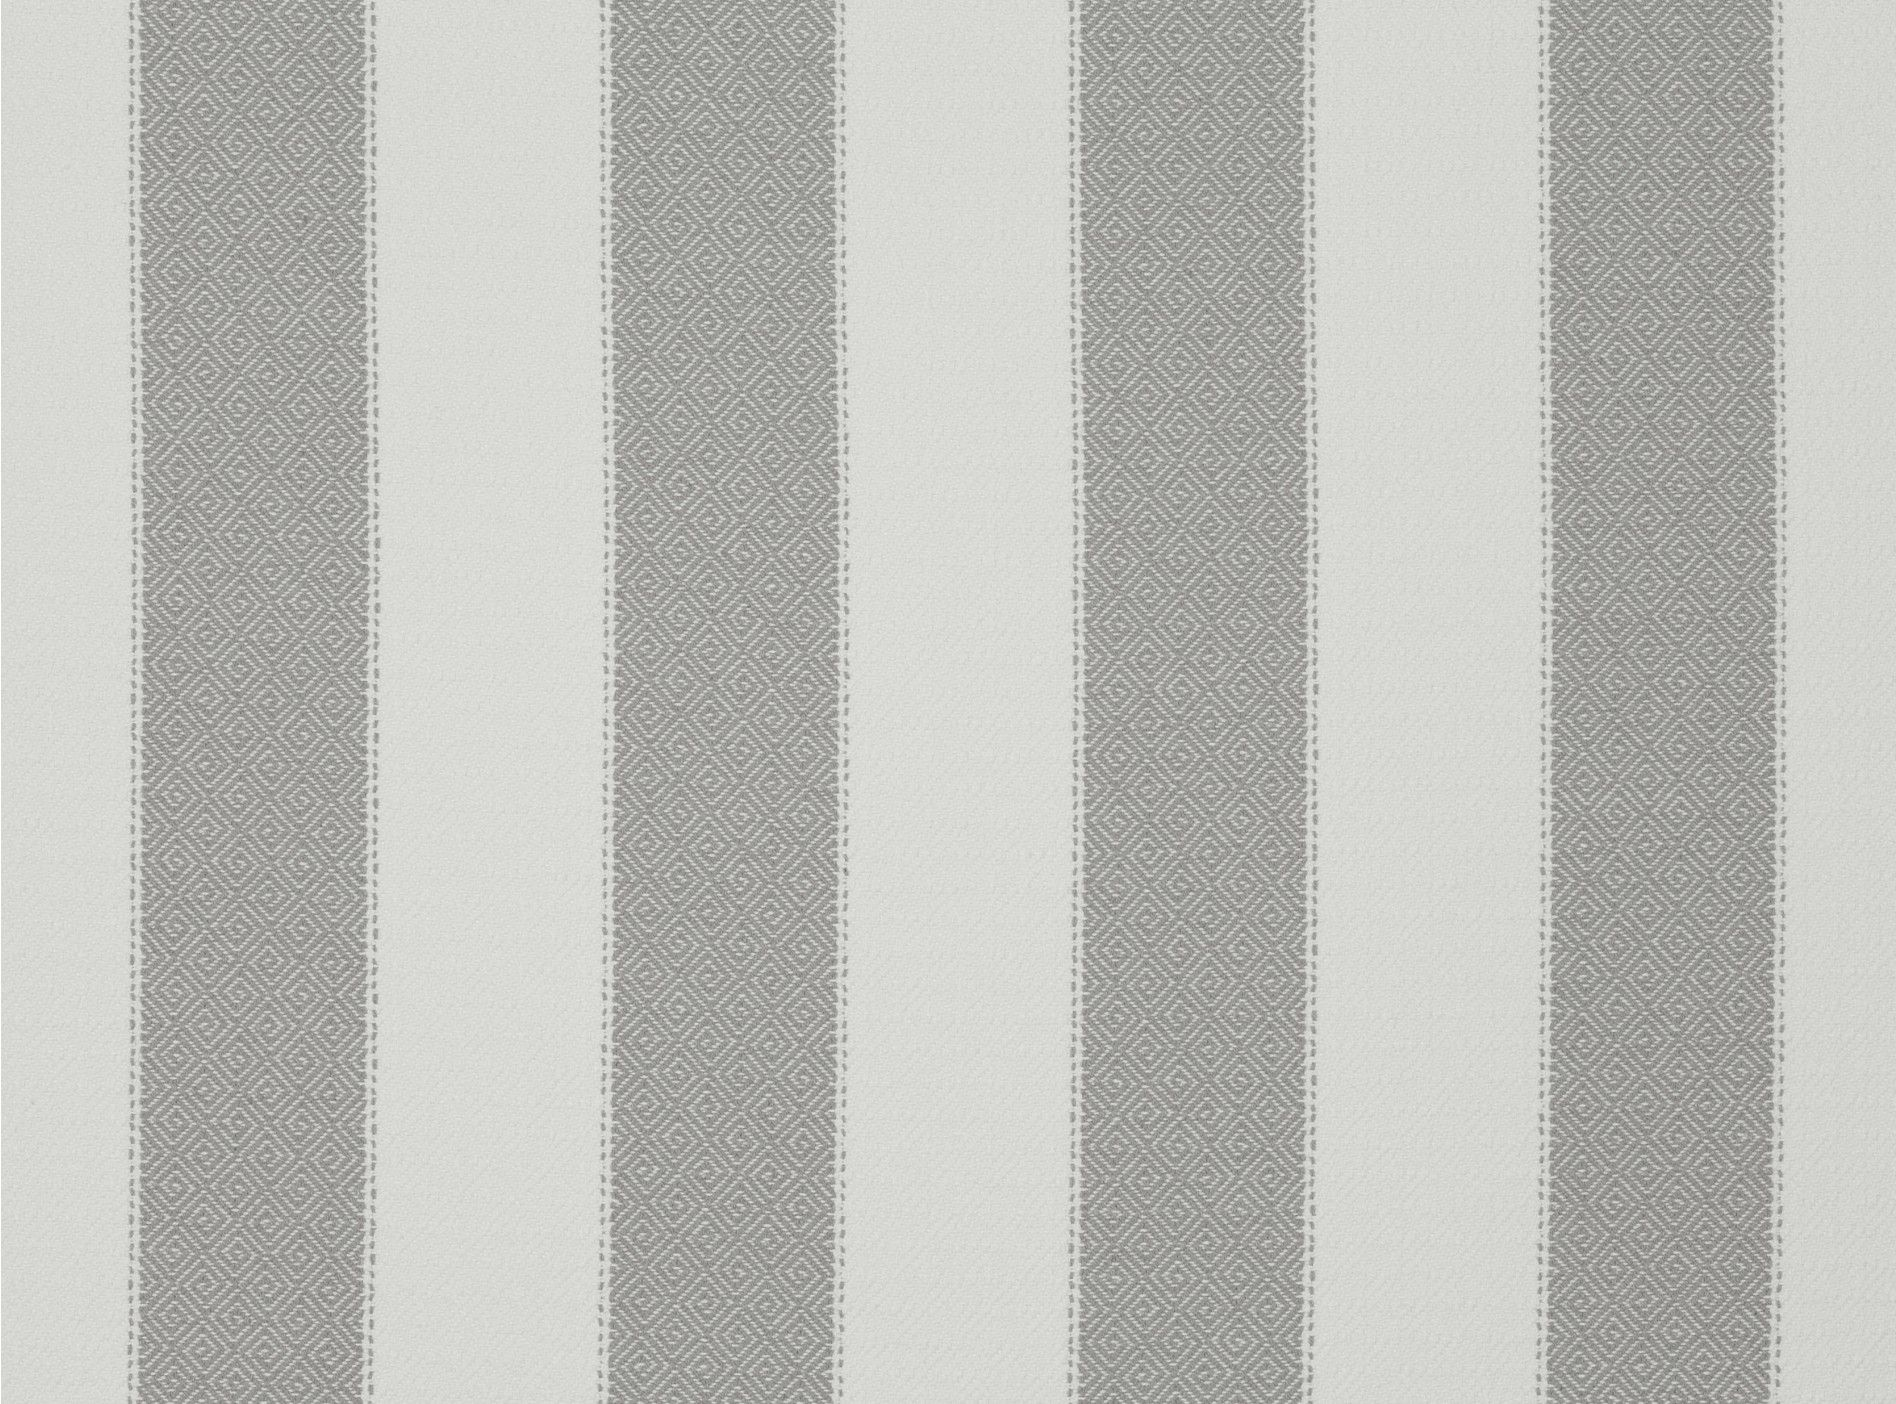 gray white barn pottery the pin koshi barns mist yard alexander mark stripe by fabric cotton